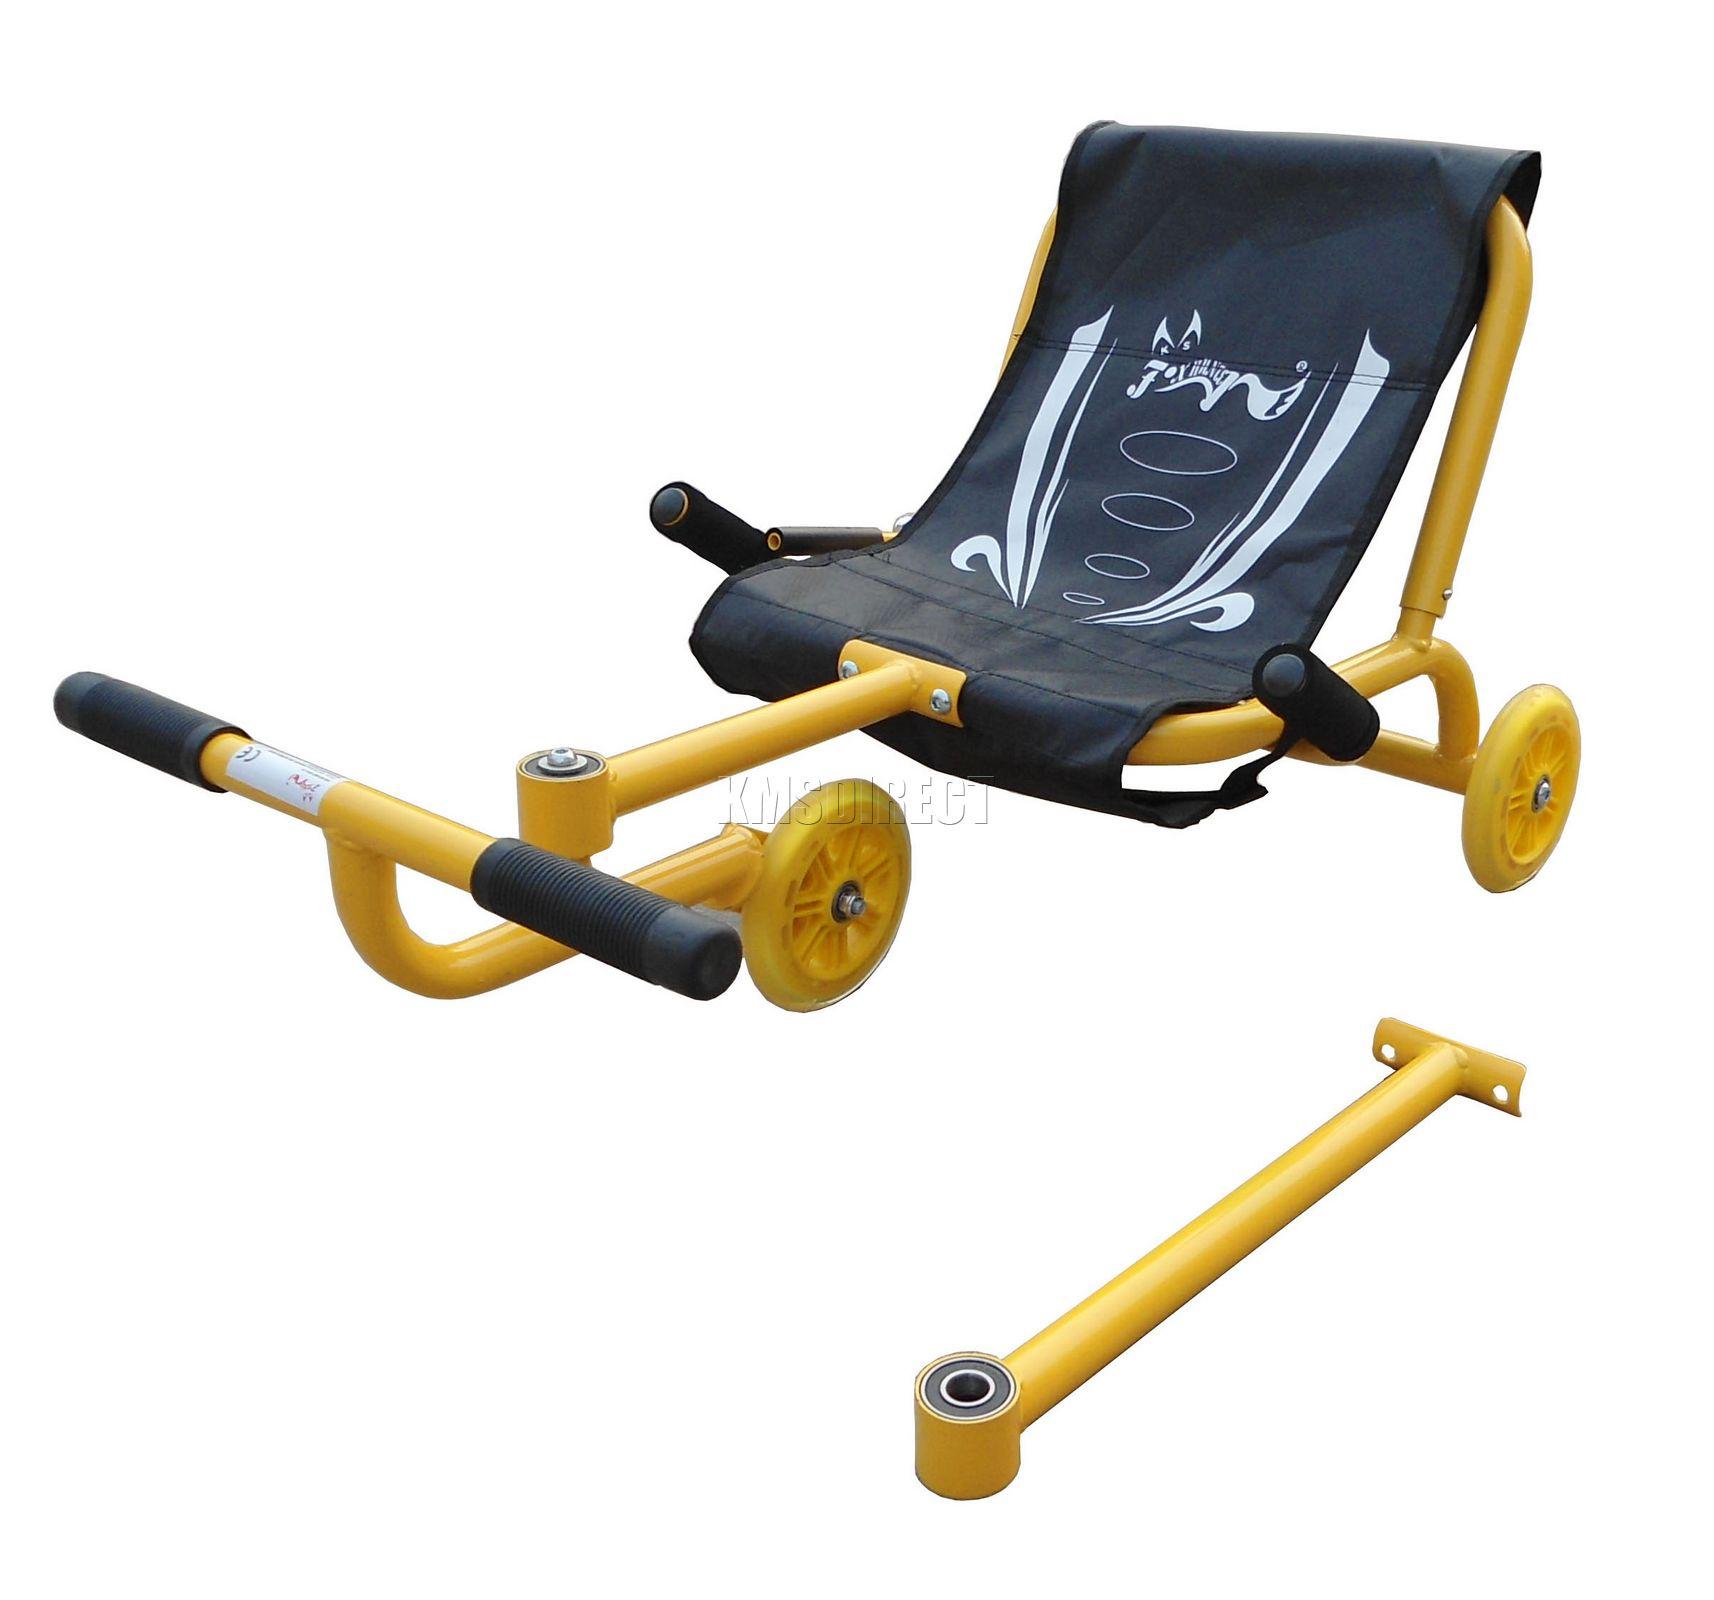 go kart kinder zum daraufsitzen rennen kein pedal au en. Black Bedroom Furniture Sets. Home Design Ideas